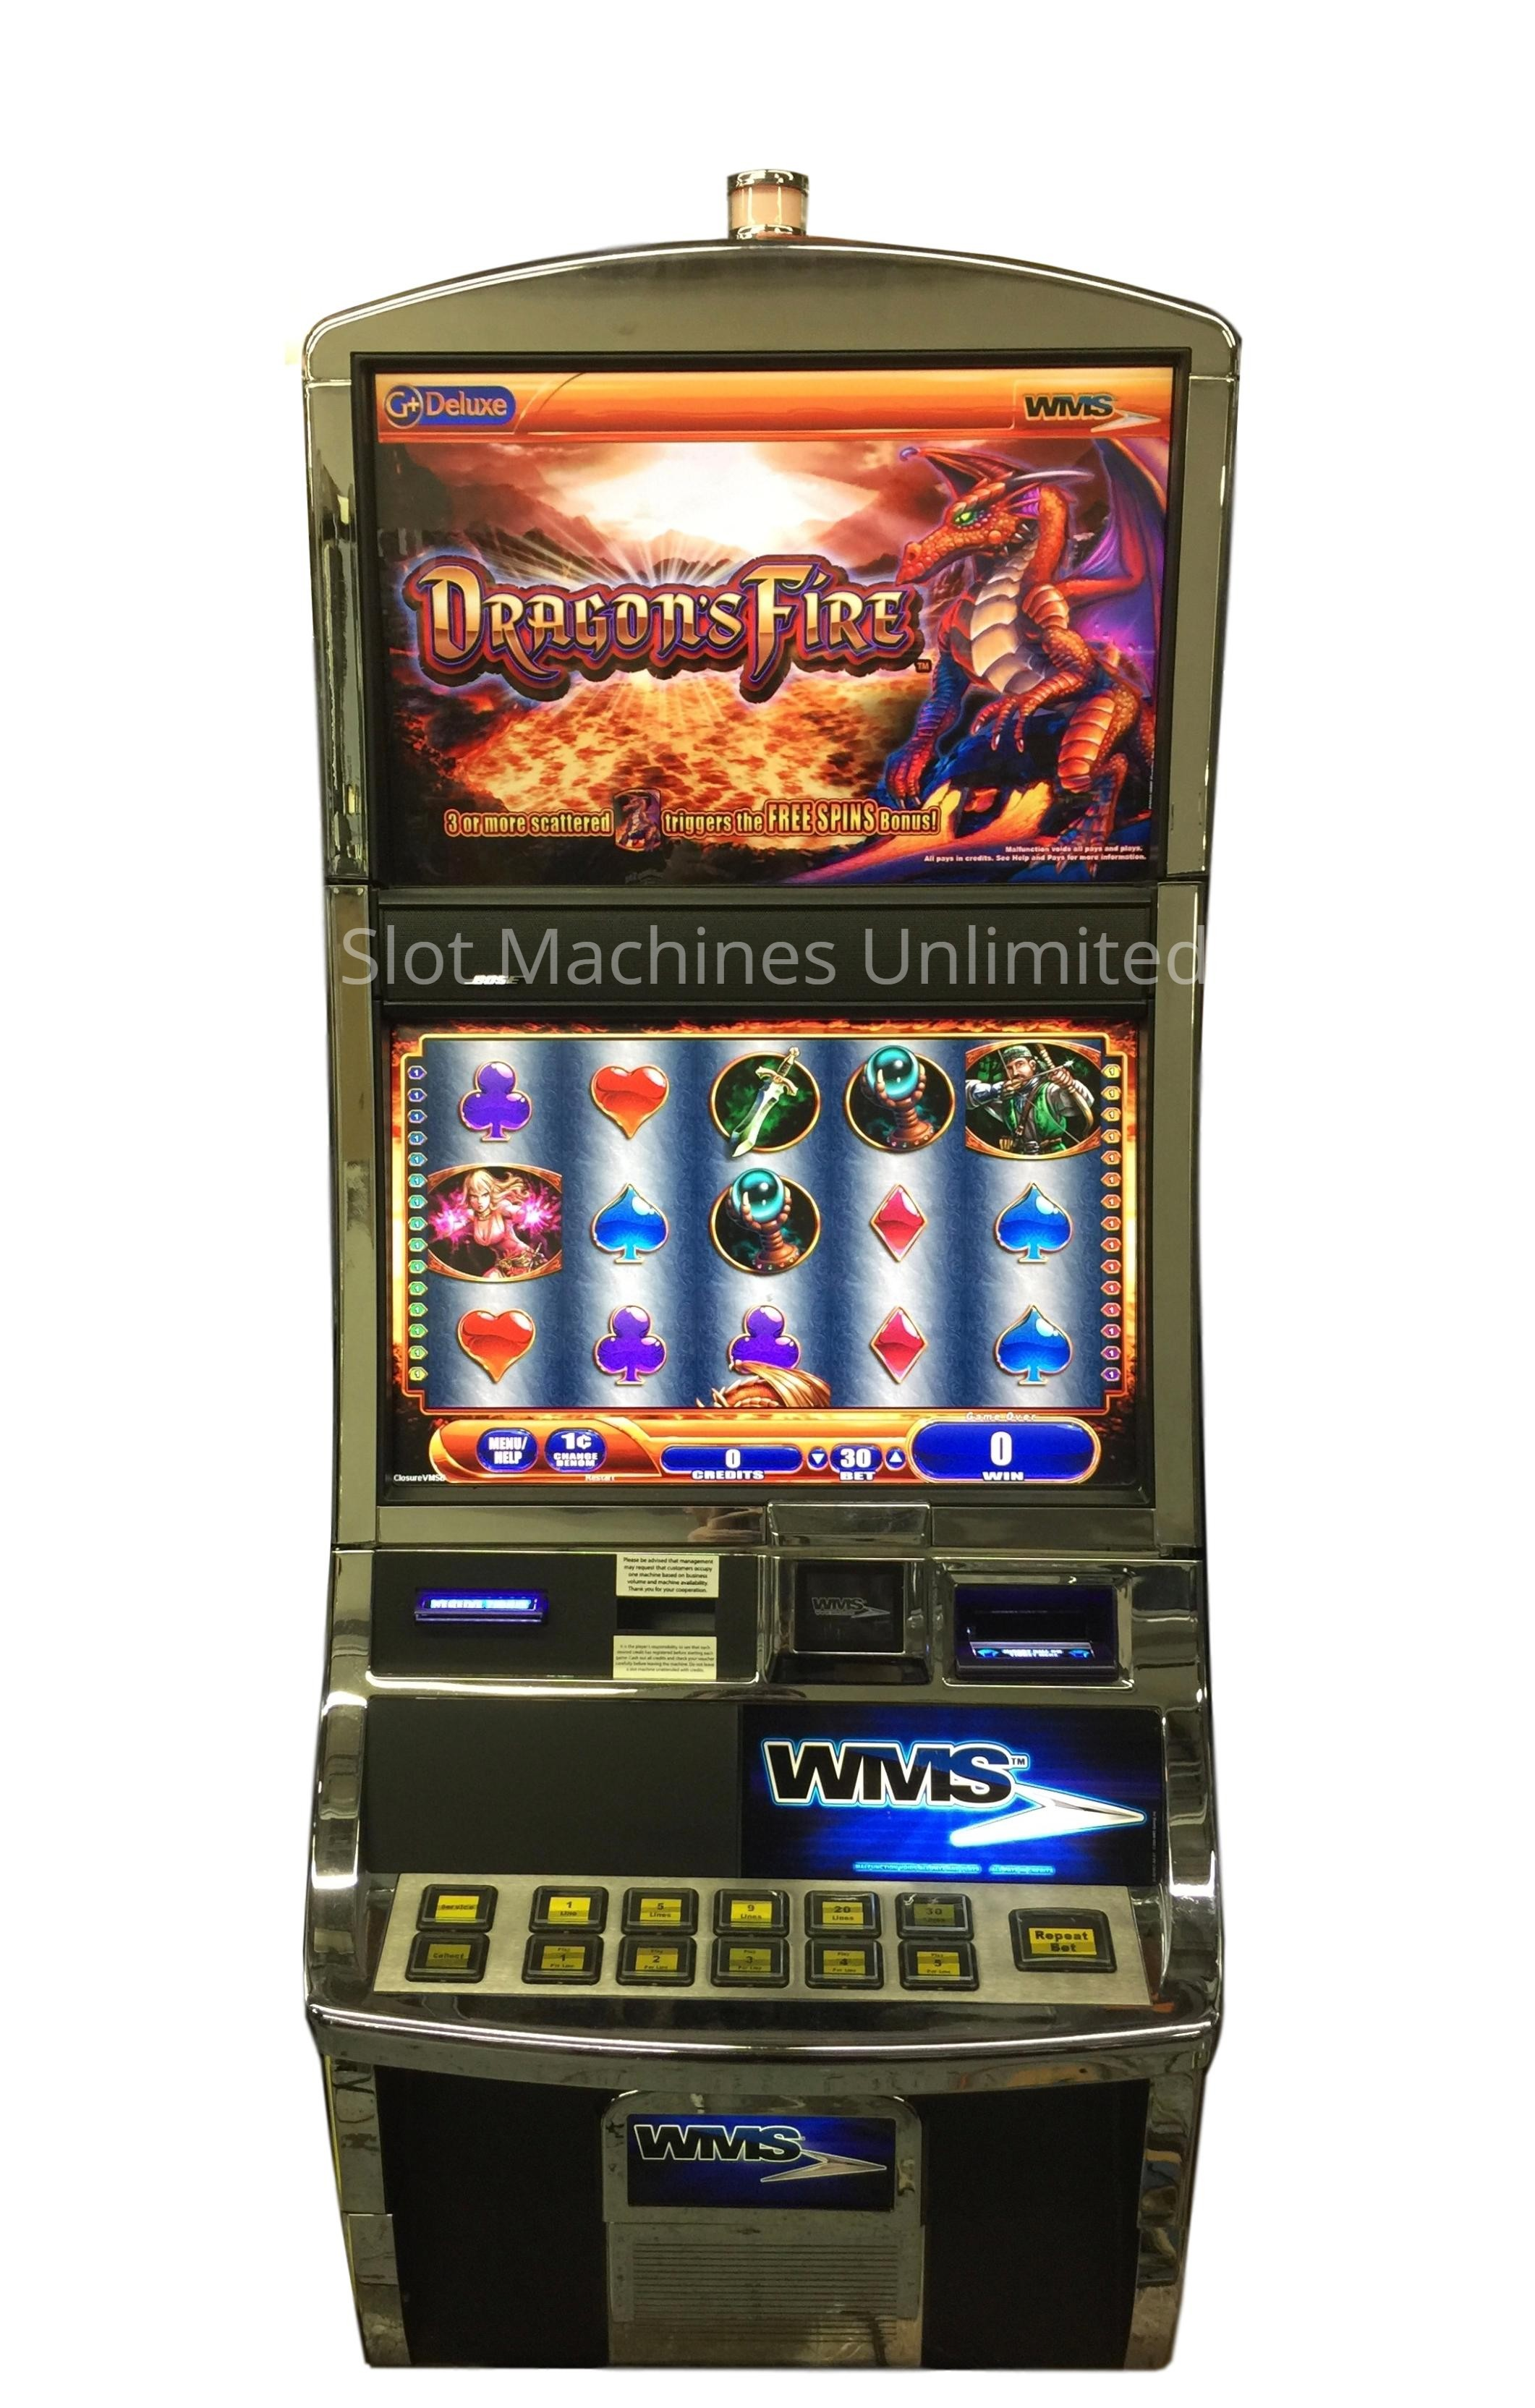 Dragons Fire Slot Machine